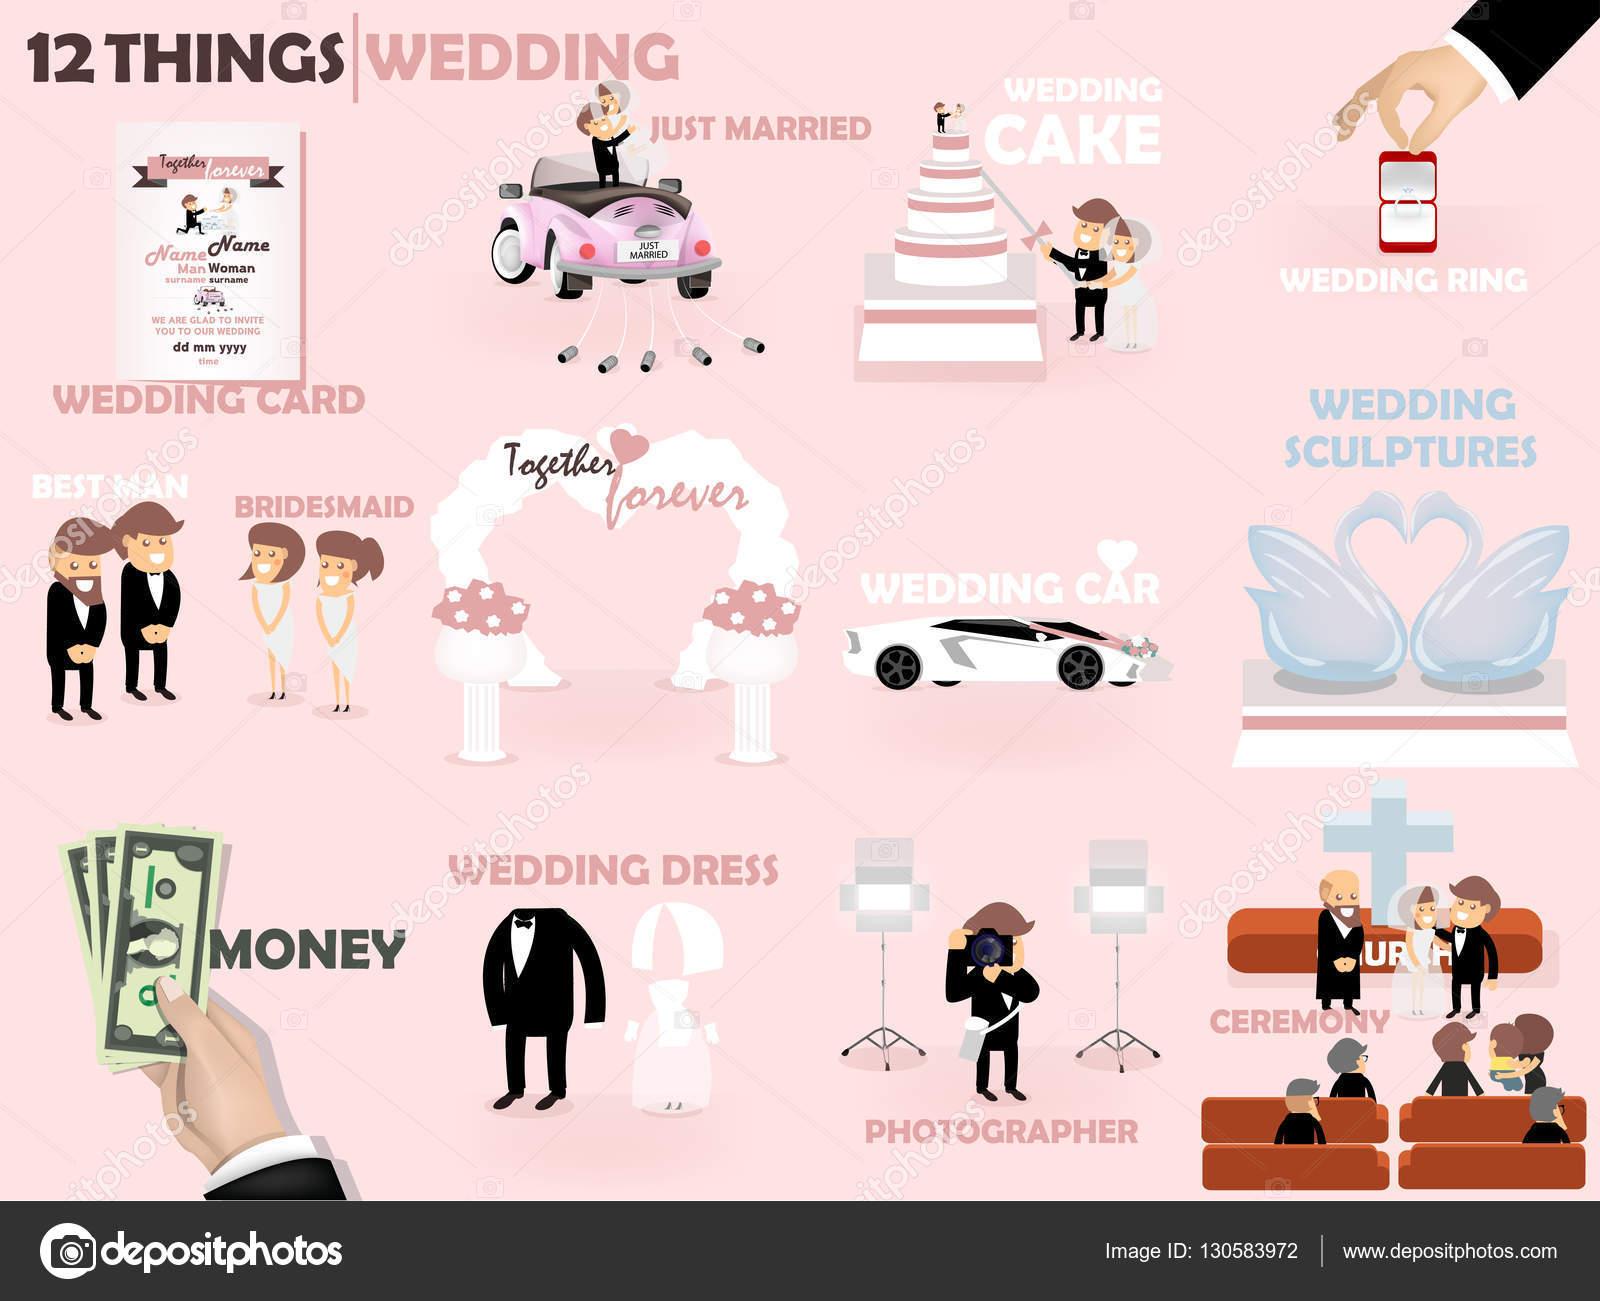 Ceremony clipart graphic design Wedding 12 money design Beautiful